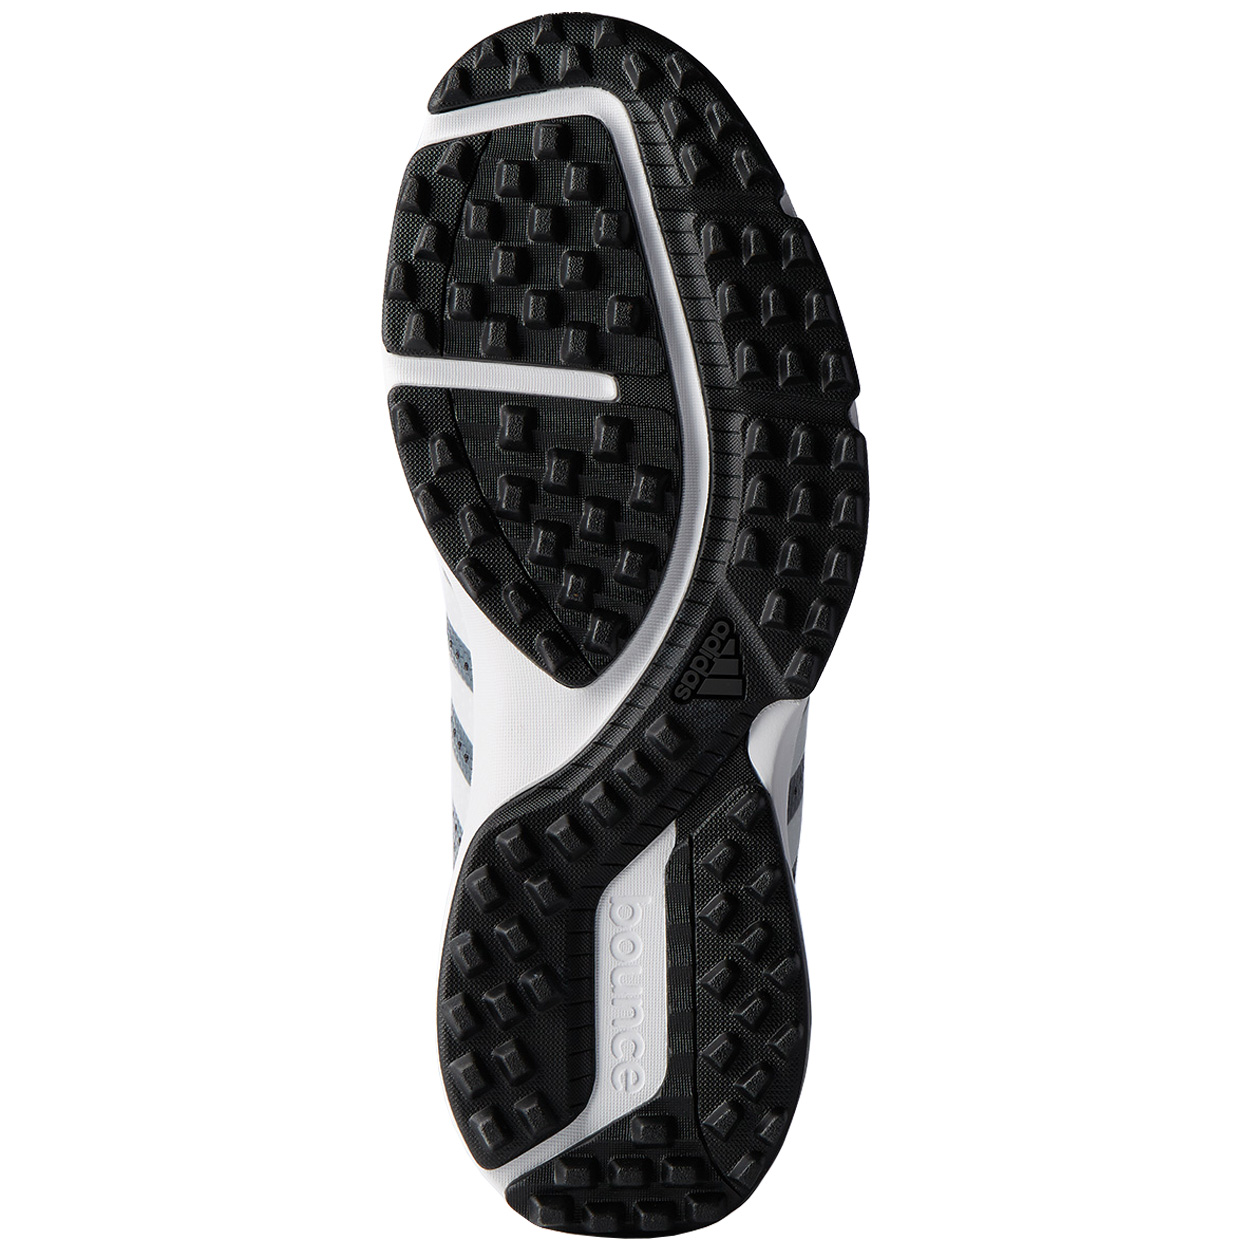 Adidas-Men-039-s-360-Traxion-Golf-Shoes thumbnail 13